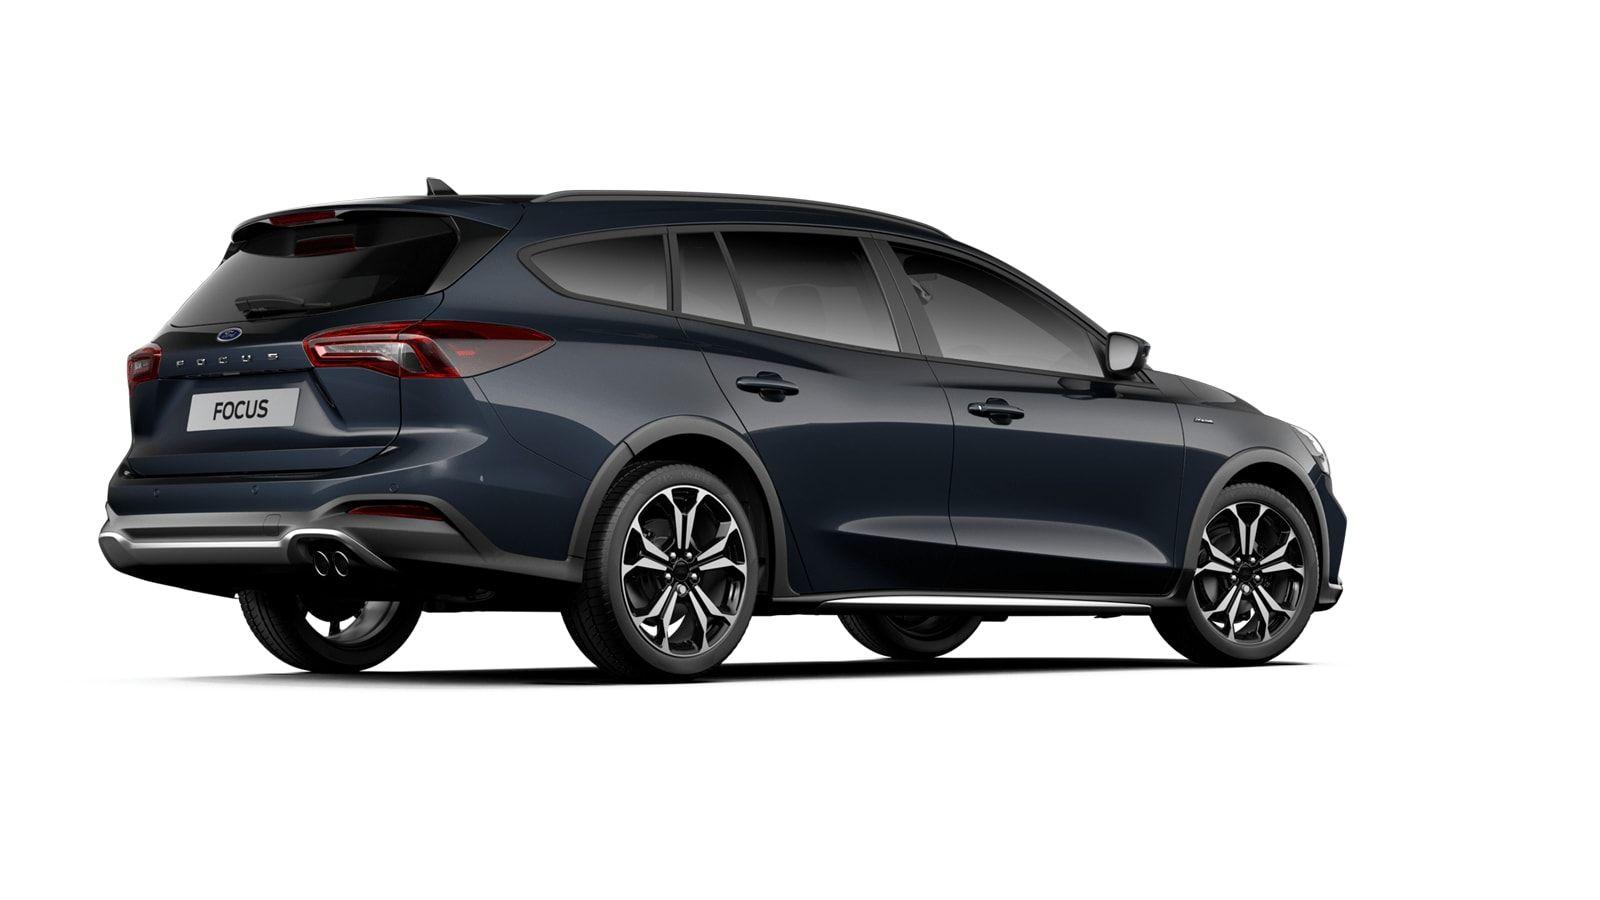 "Nieuw Ford Focus Active X 1.5 EcoBlue 120pk / 88kW A8 - 5d FCD - ""Panther Blue"" Exclusieve metaalkleur 2"